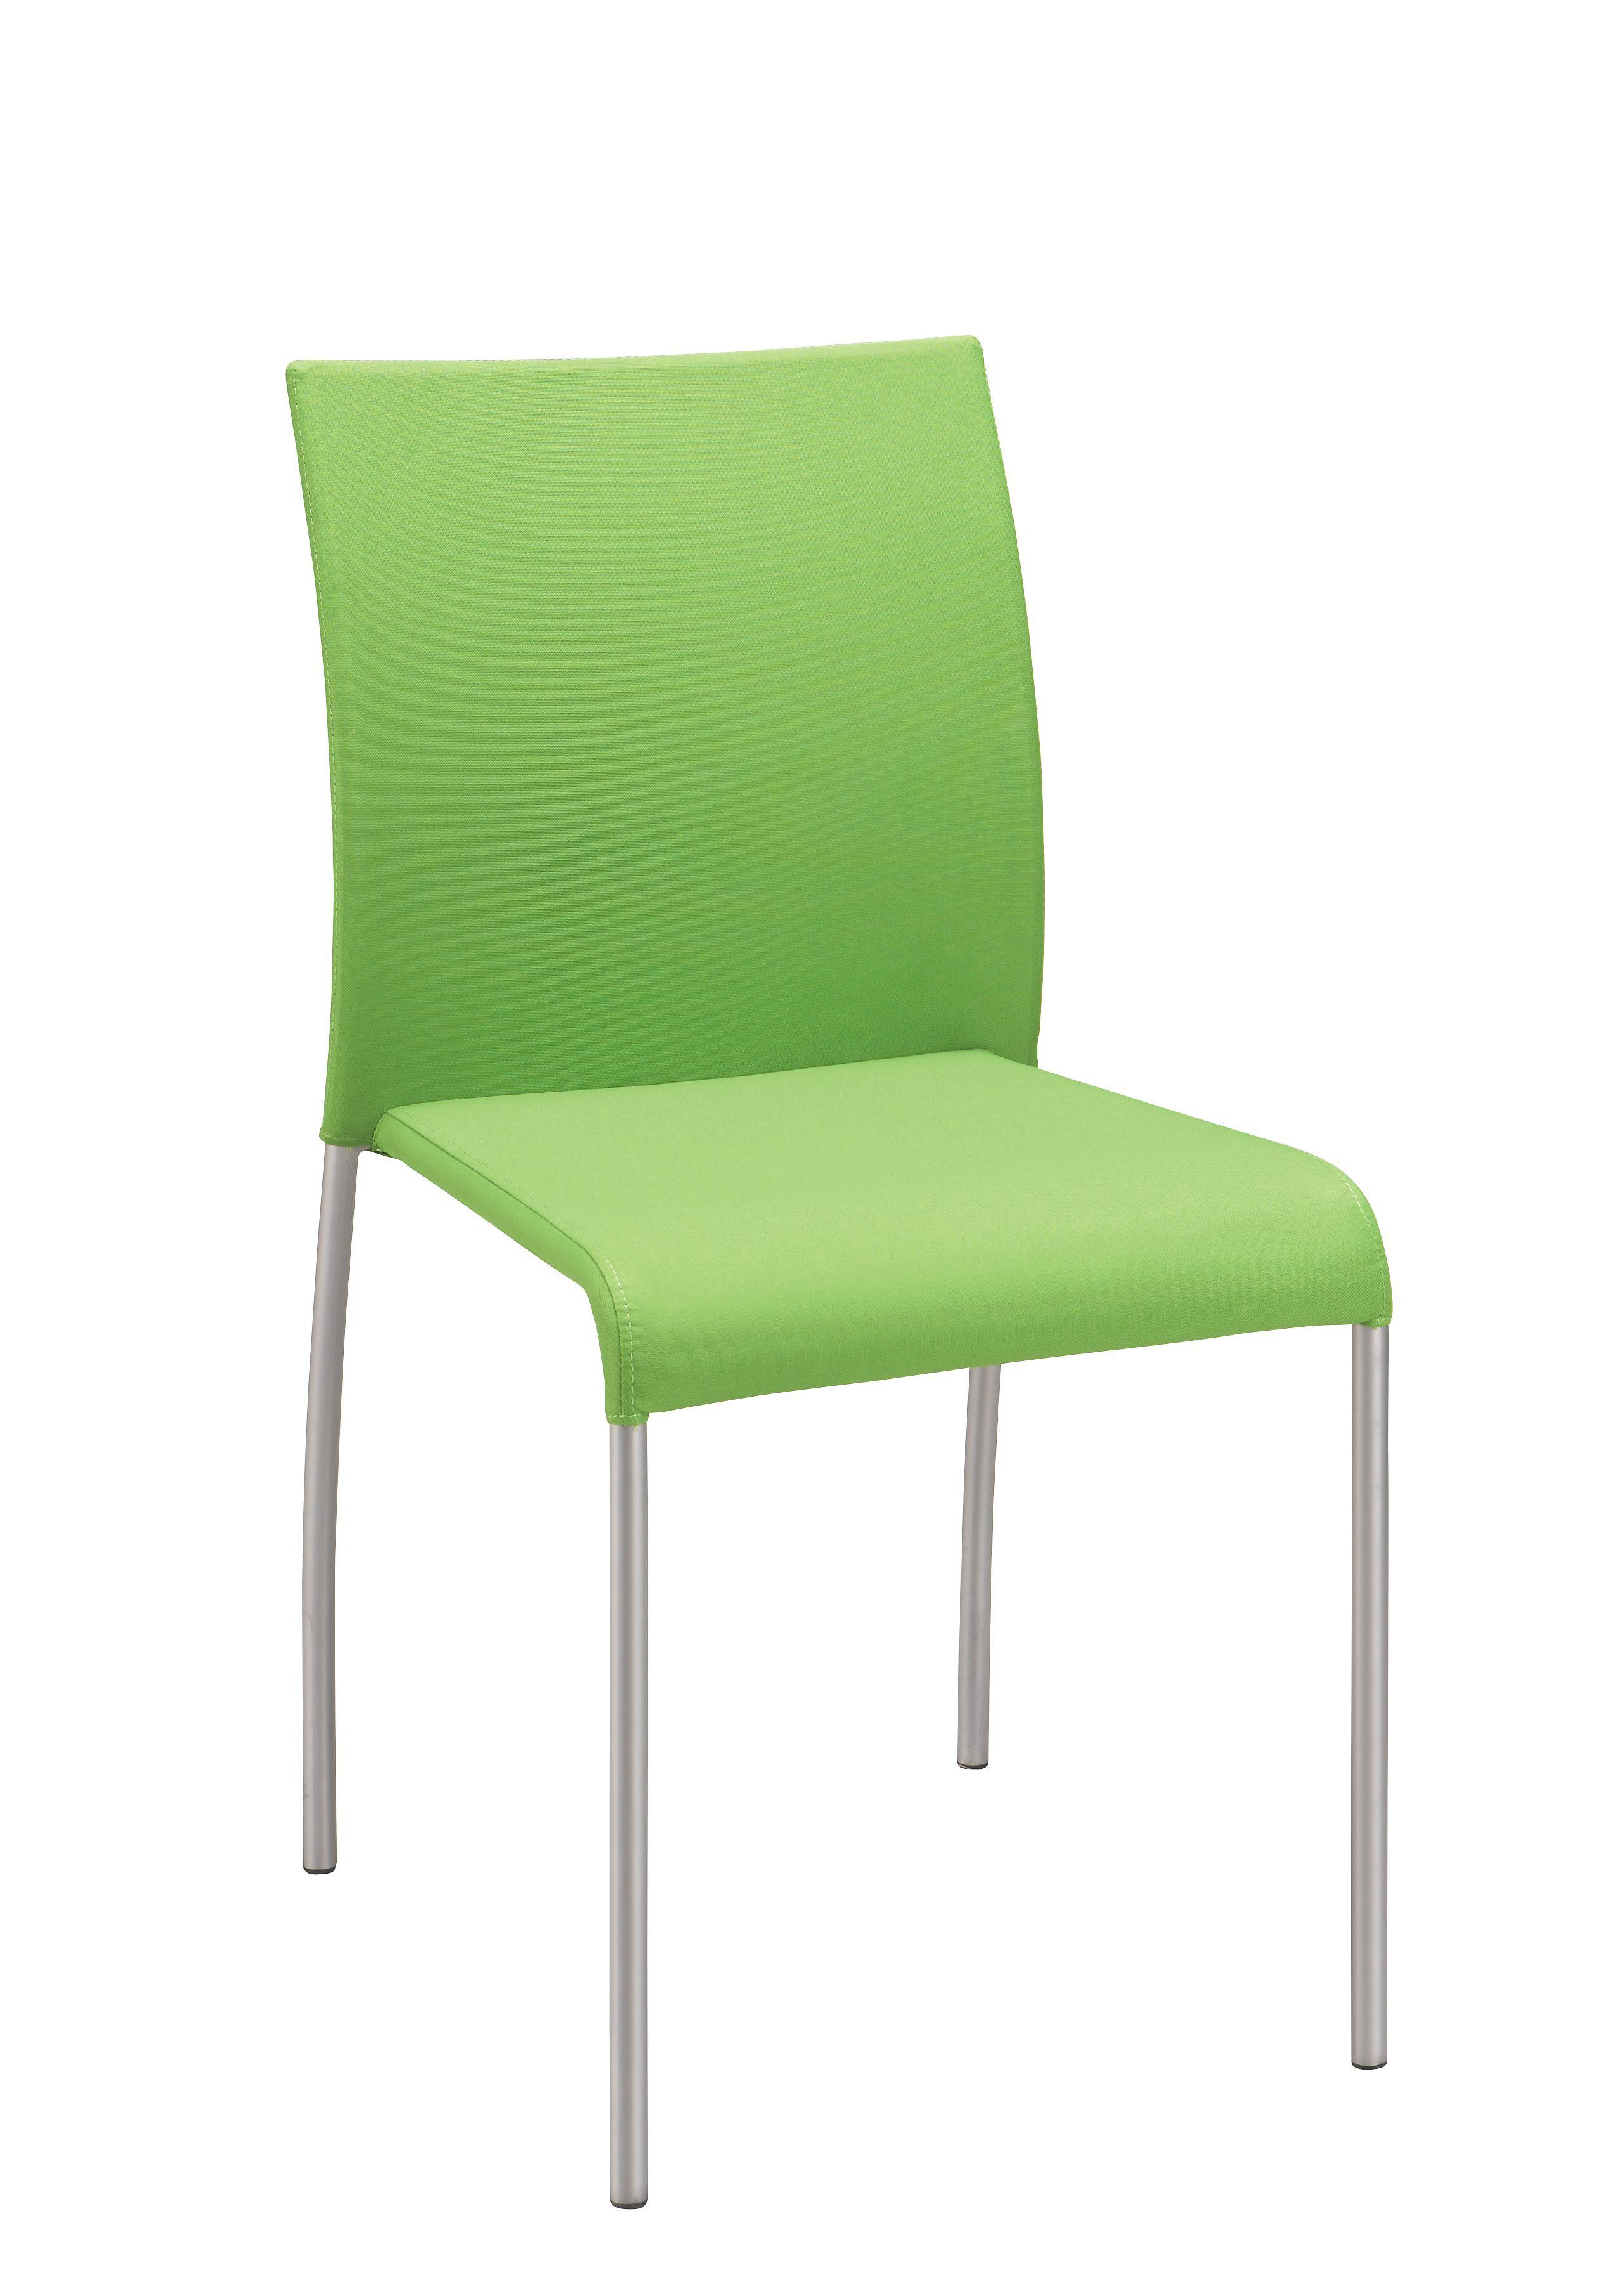 Stol Günther - zelena/barve aluminija, Moderno, kovina/tekstil (55/85/45cm) - MÖMAX modern living